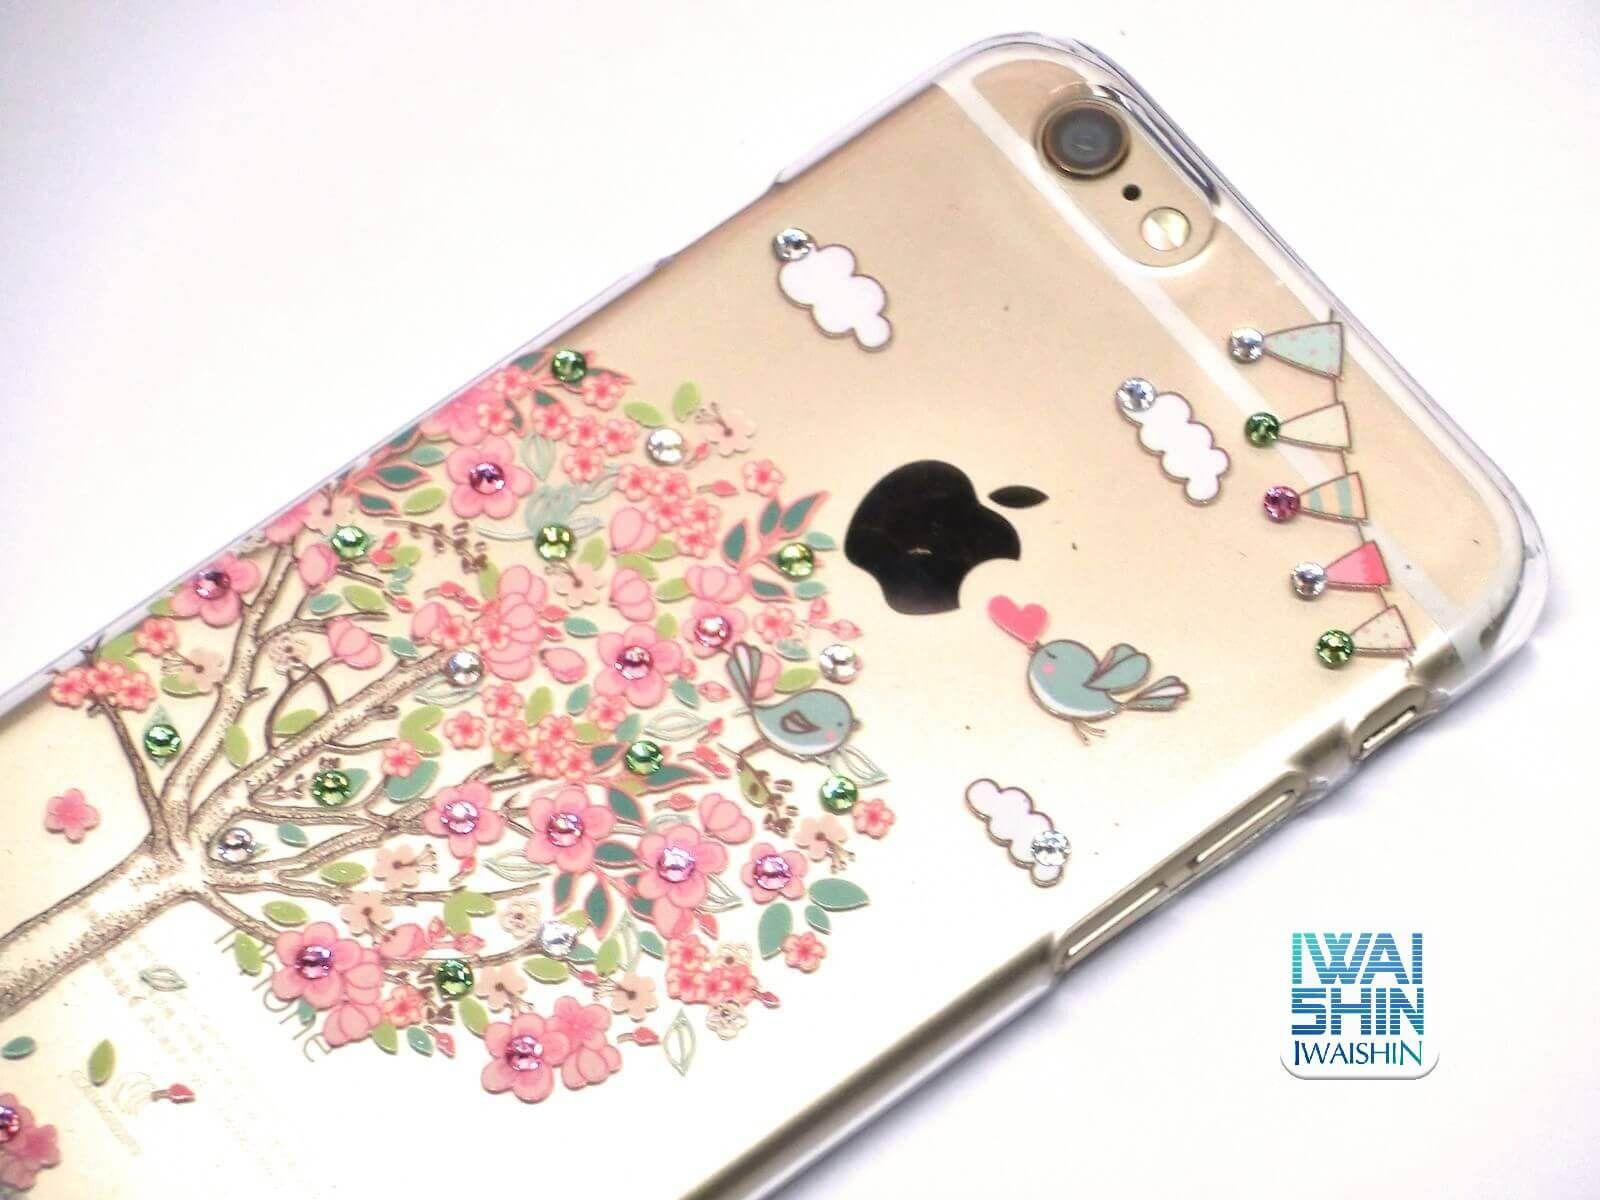 APBS 施華洛世奇 IPhone 6 保護殼5741